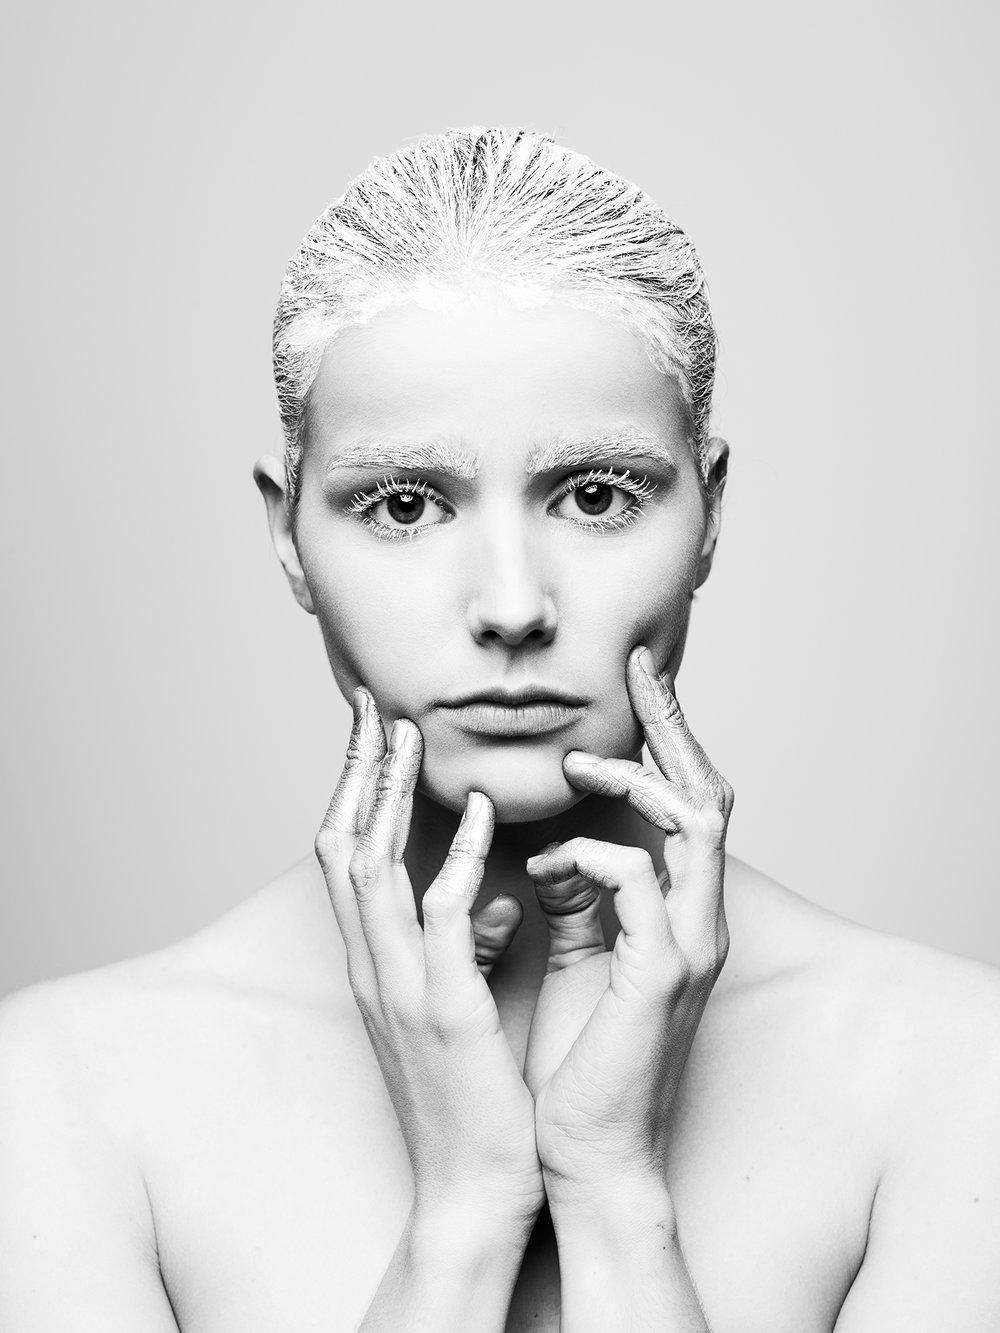 Oscar-arribas-photography-fotografo-portrait-retrato-editorial-fashion-beauty-09.jpg